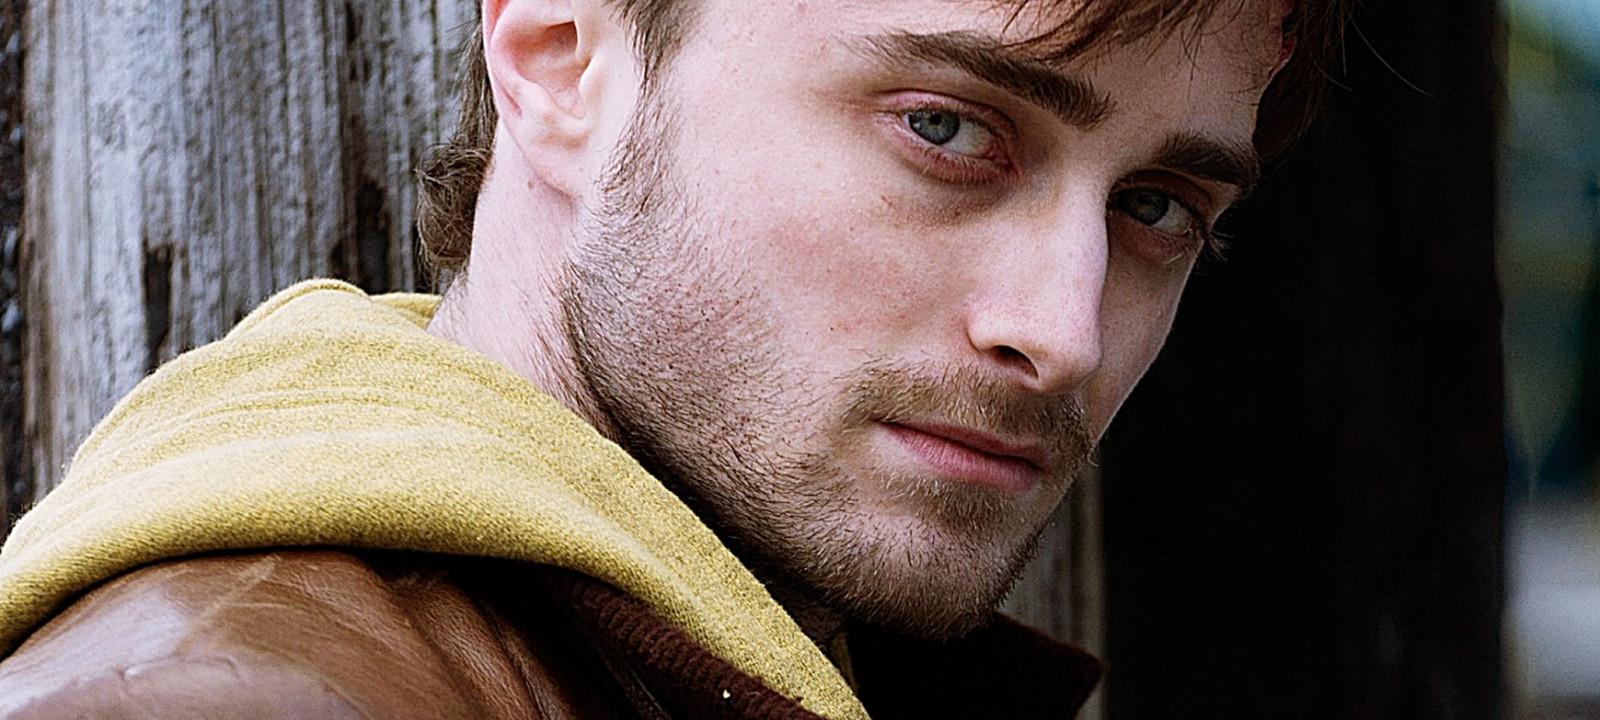 Daniel Radcliffe in 'Horns' (Photo: Dimension Films)